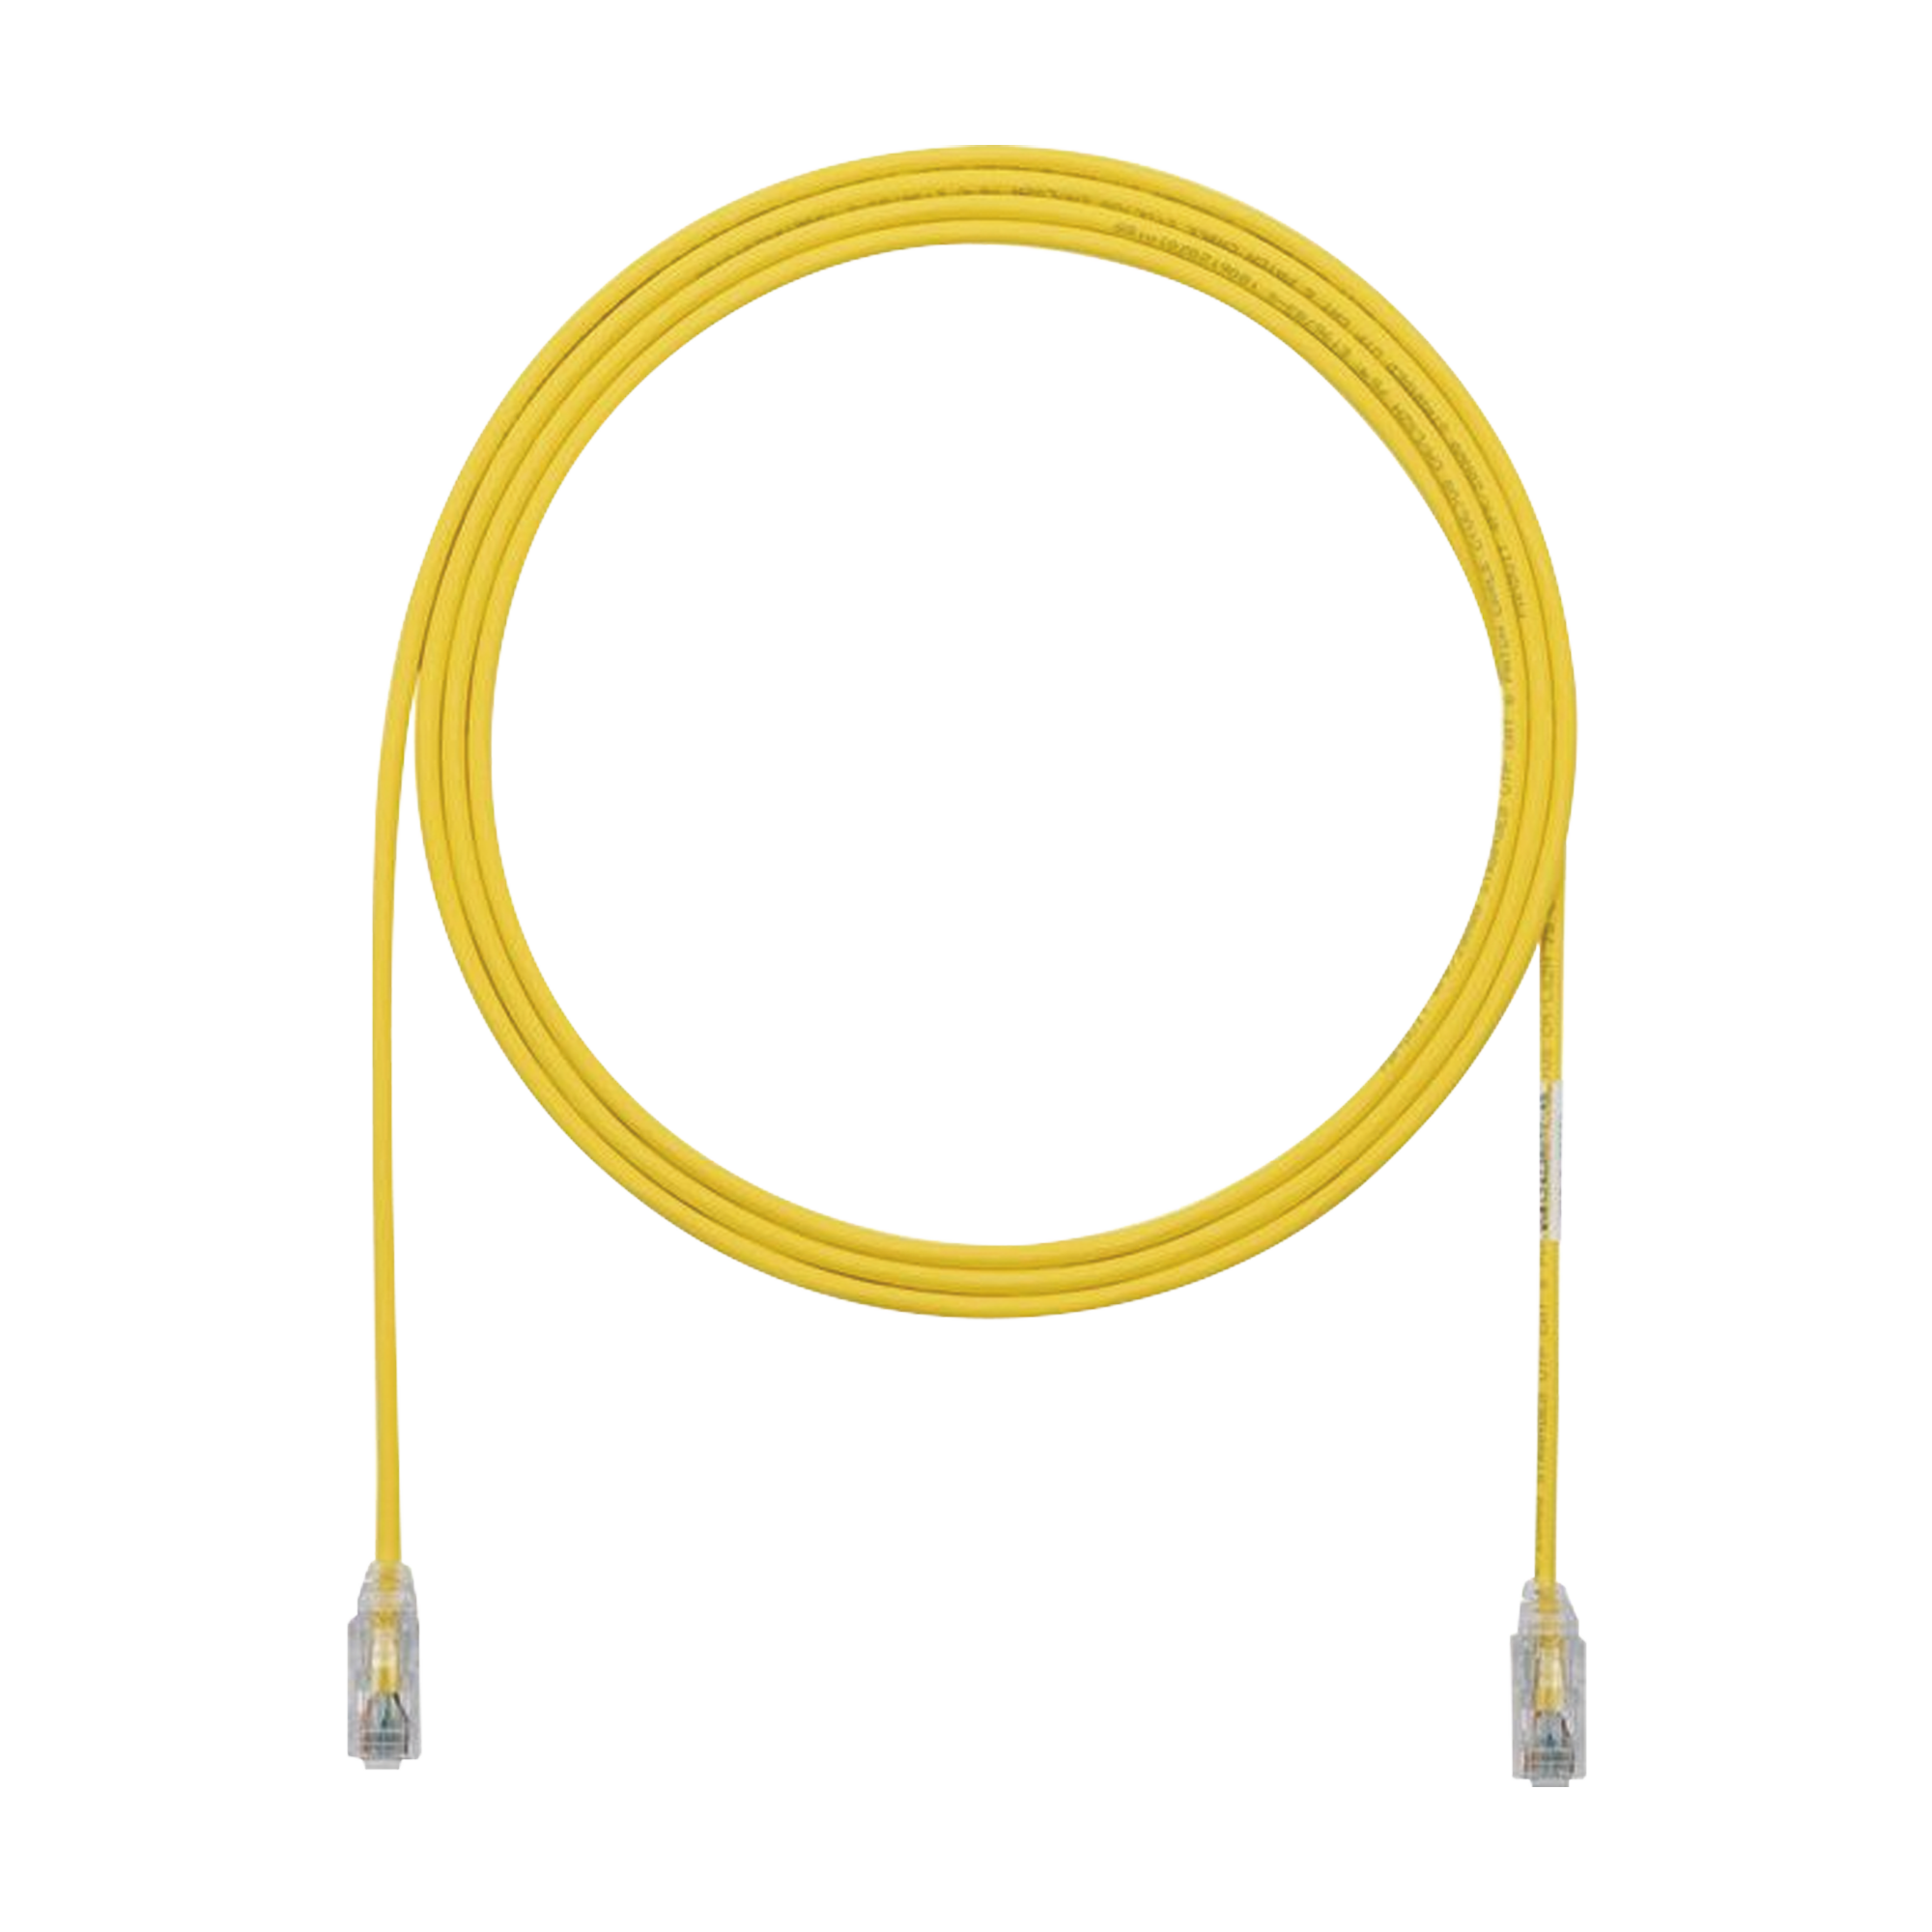 Cable de Parcheo TX6, UTP Cat6, Diámetro Reducido (28AWG), Color Amarillo, 10ft